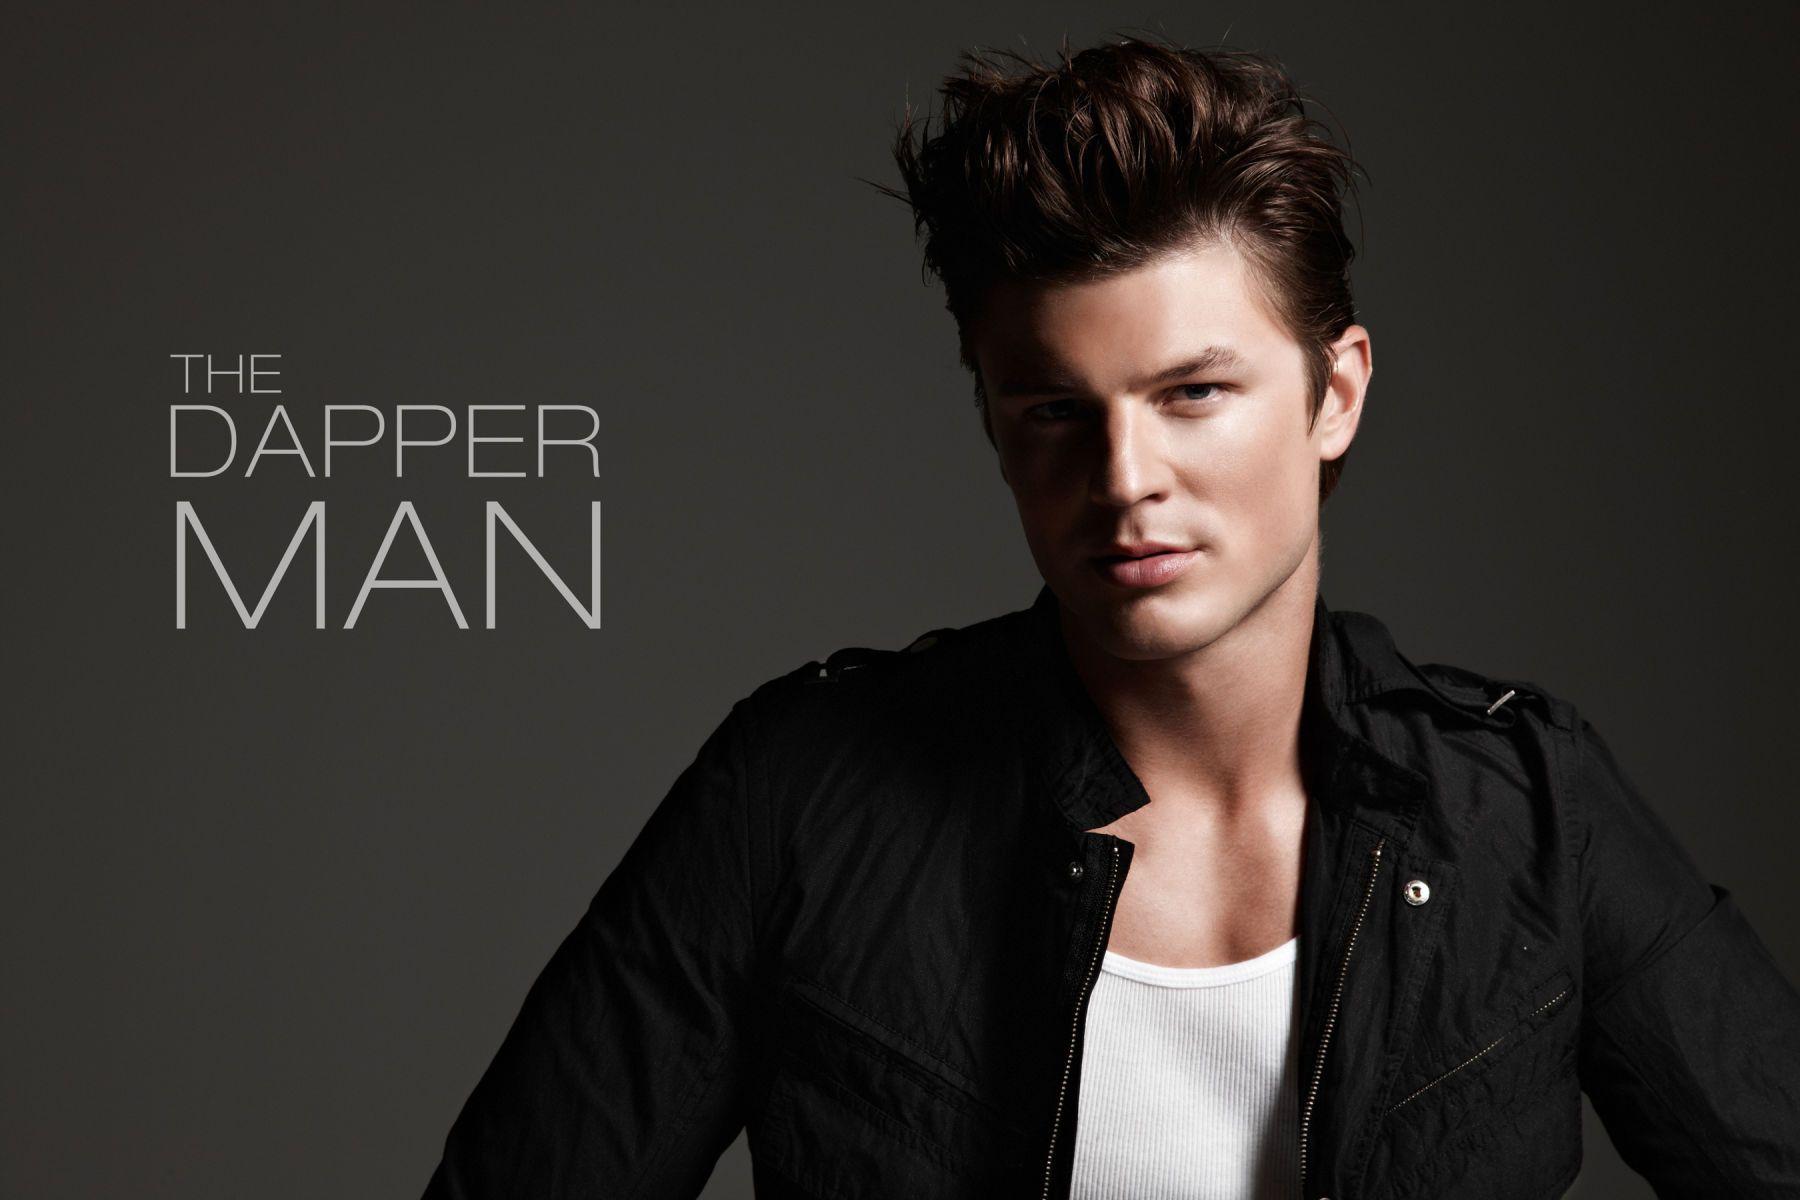 The Dapper Man